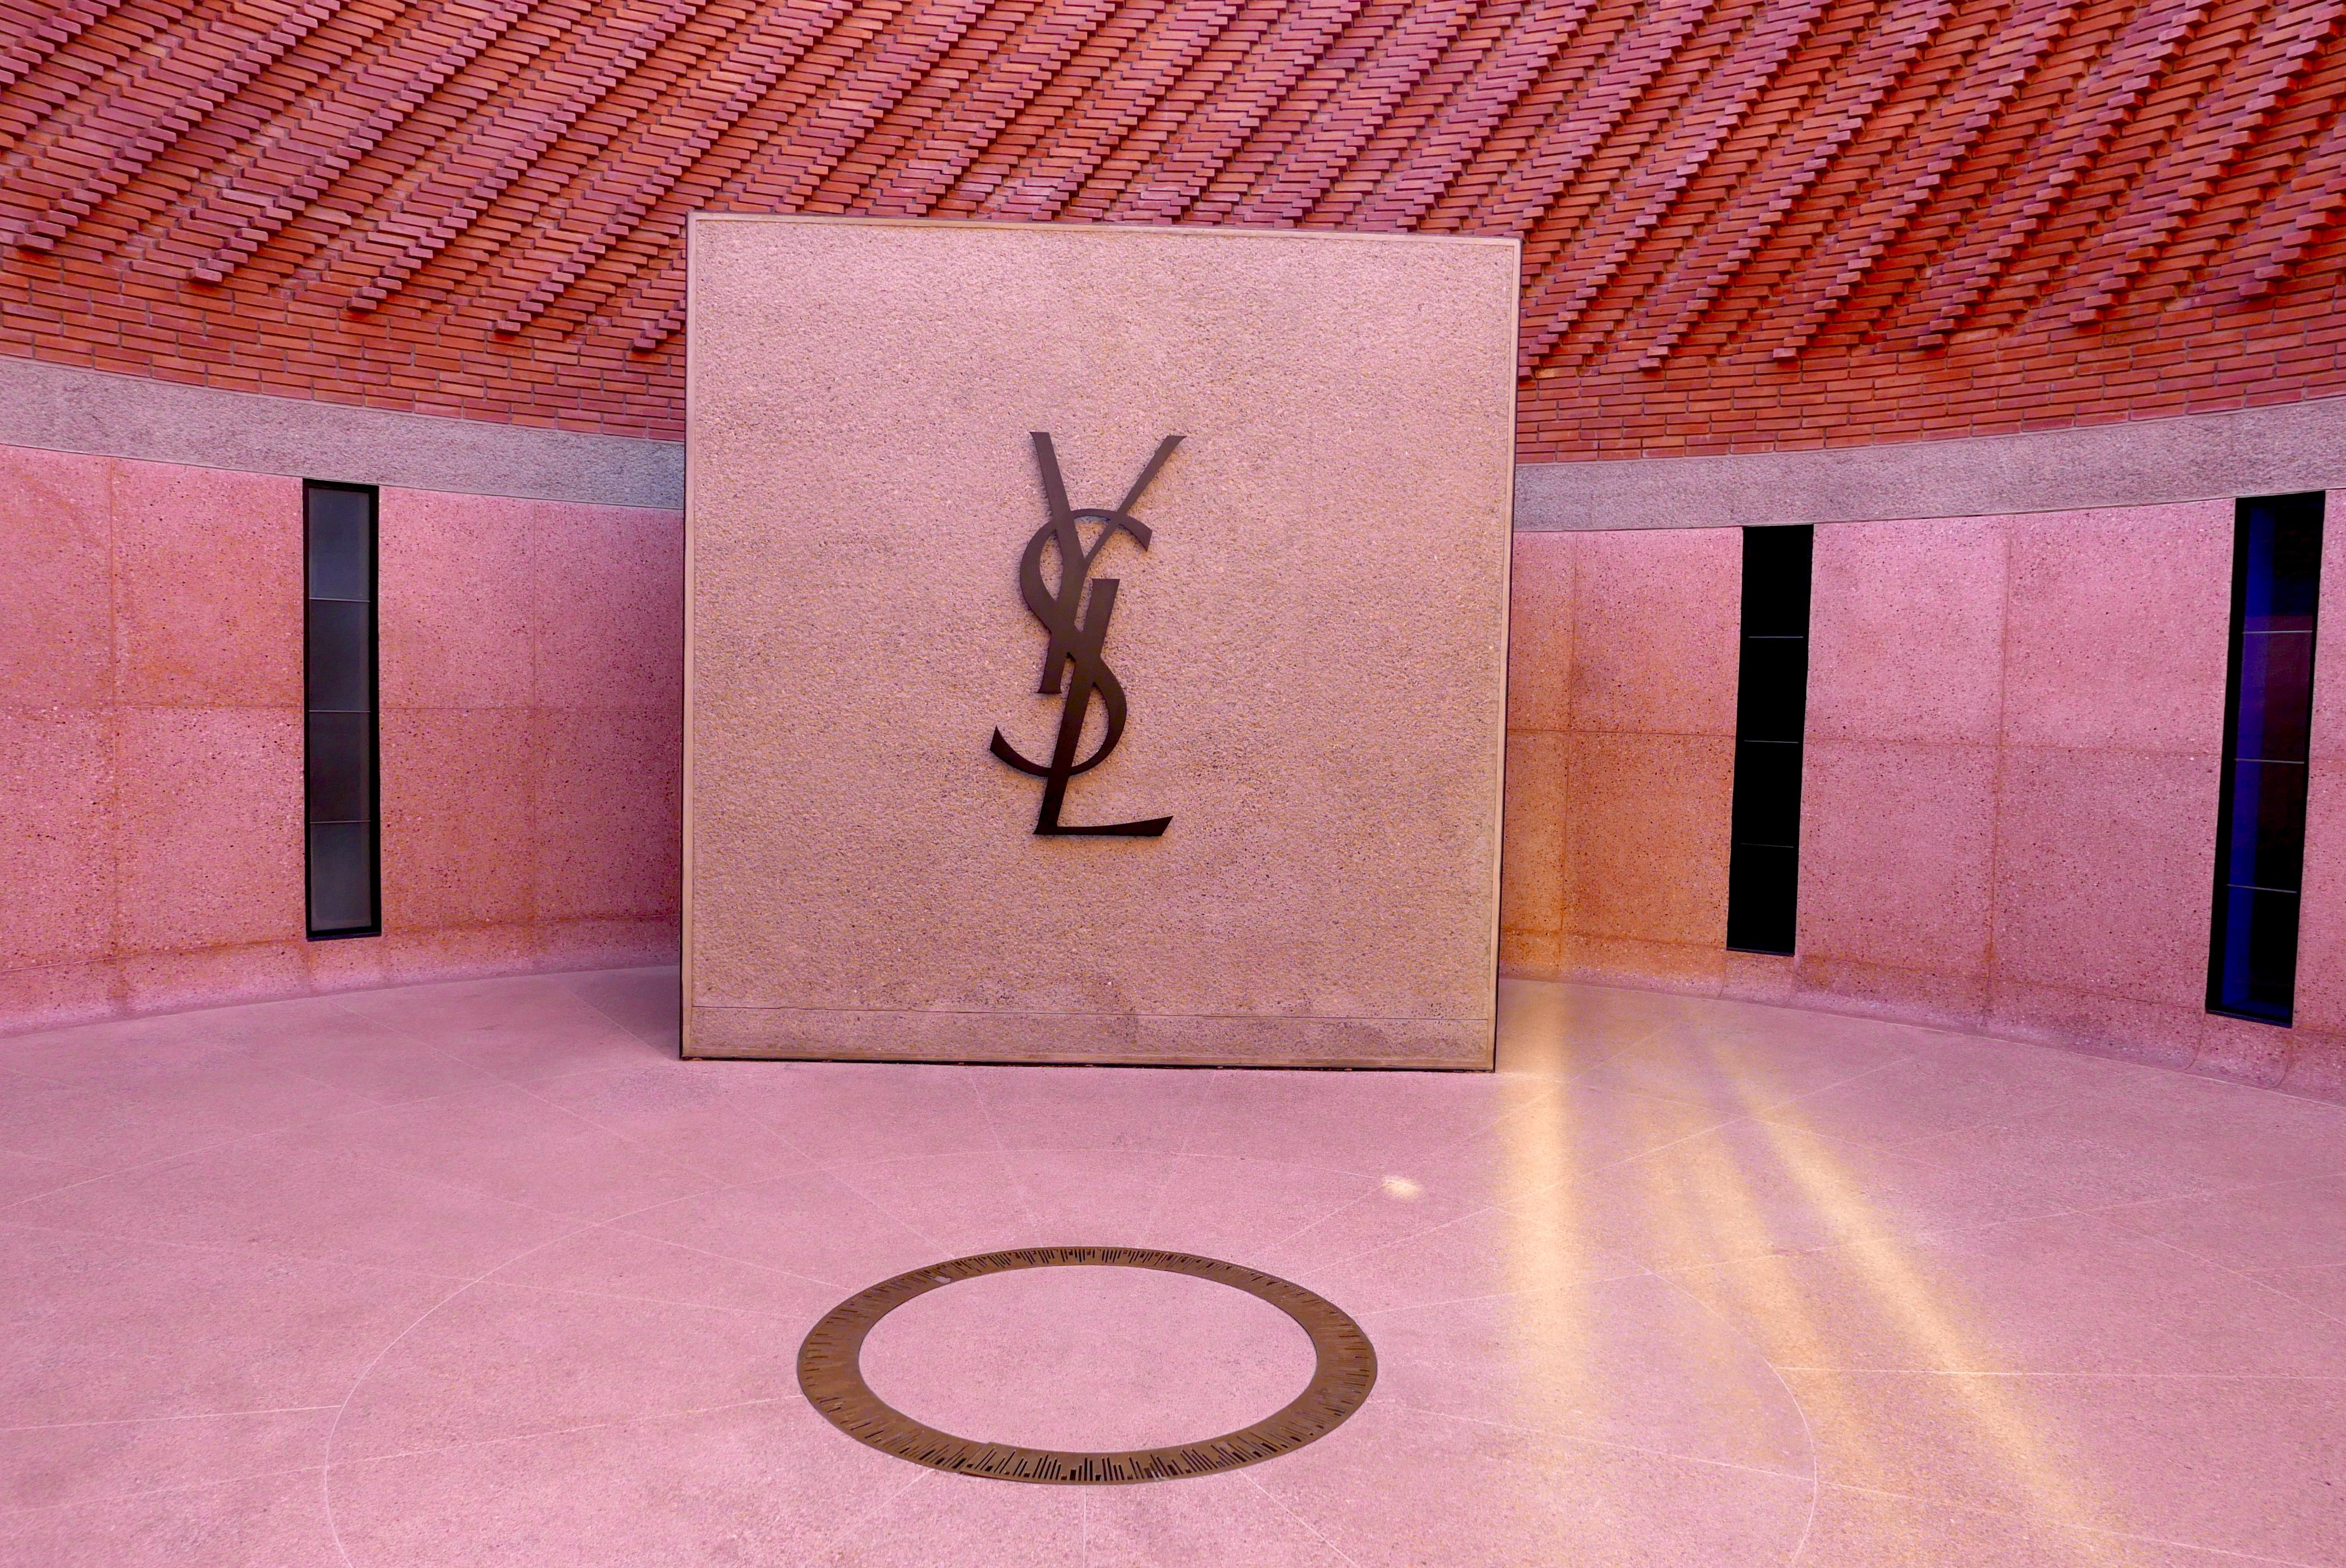 Entrada do Museu Yves Saint Laurent